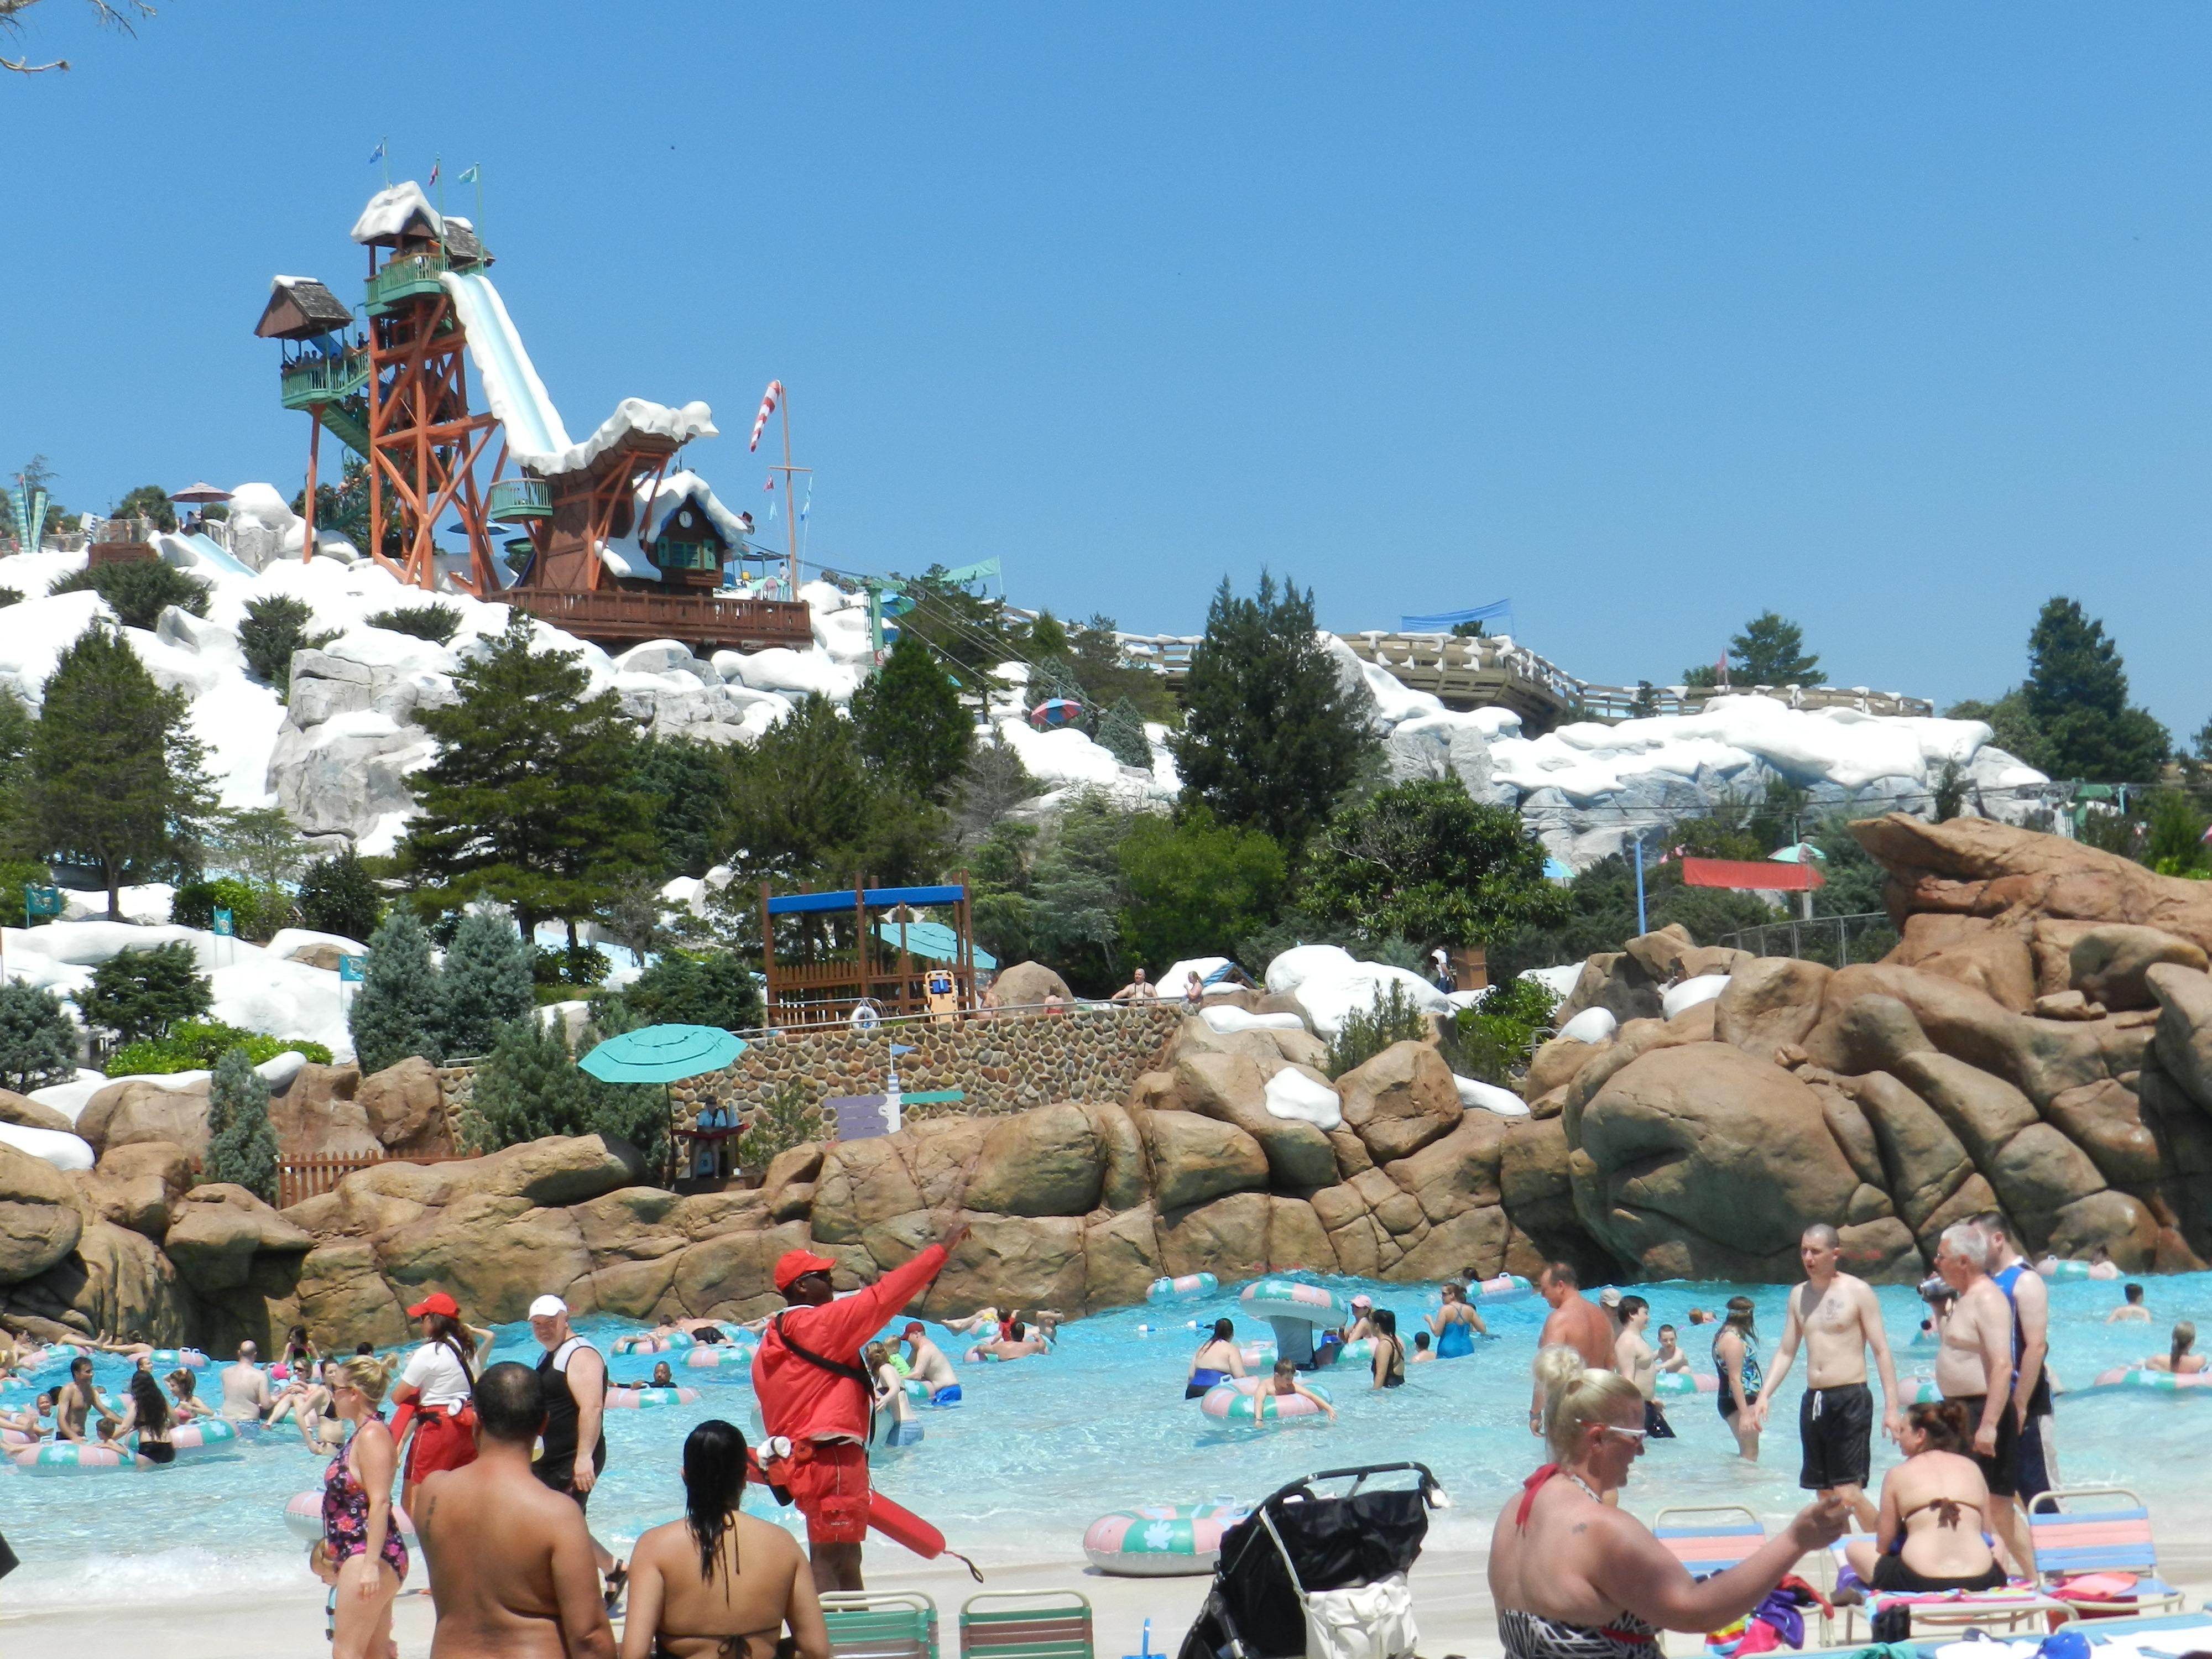 Disney's Blizzard Beach Summer 2014